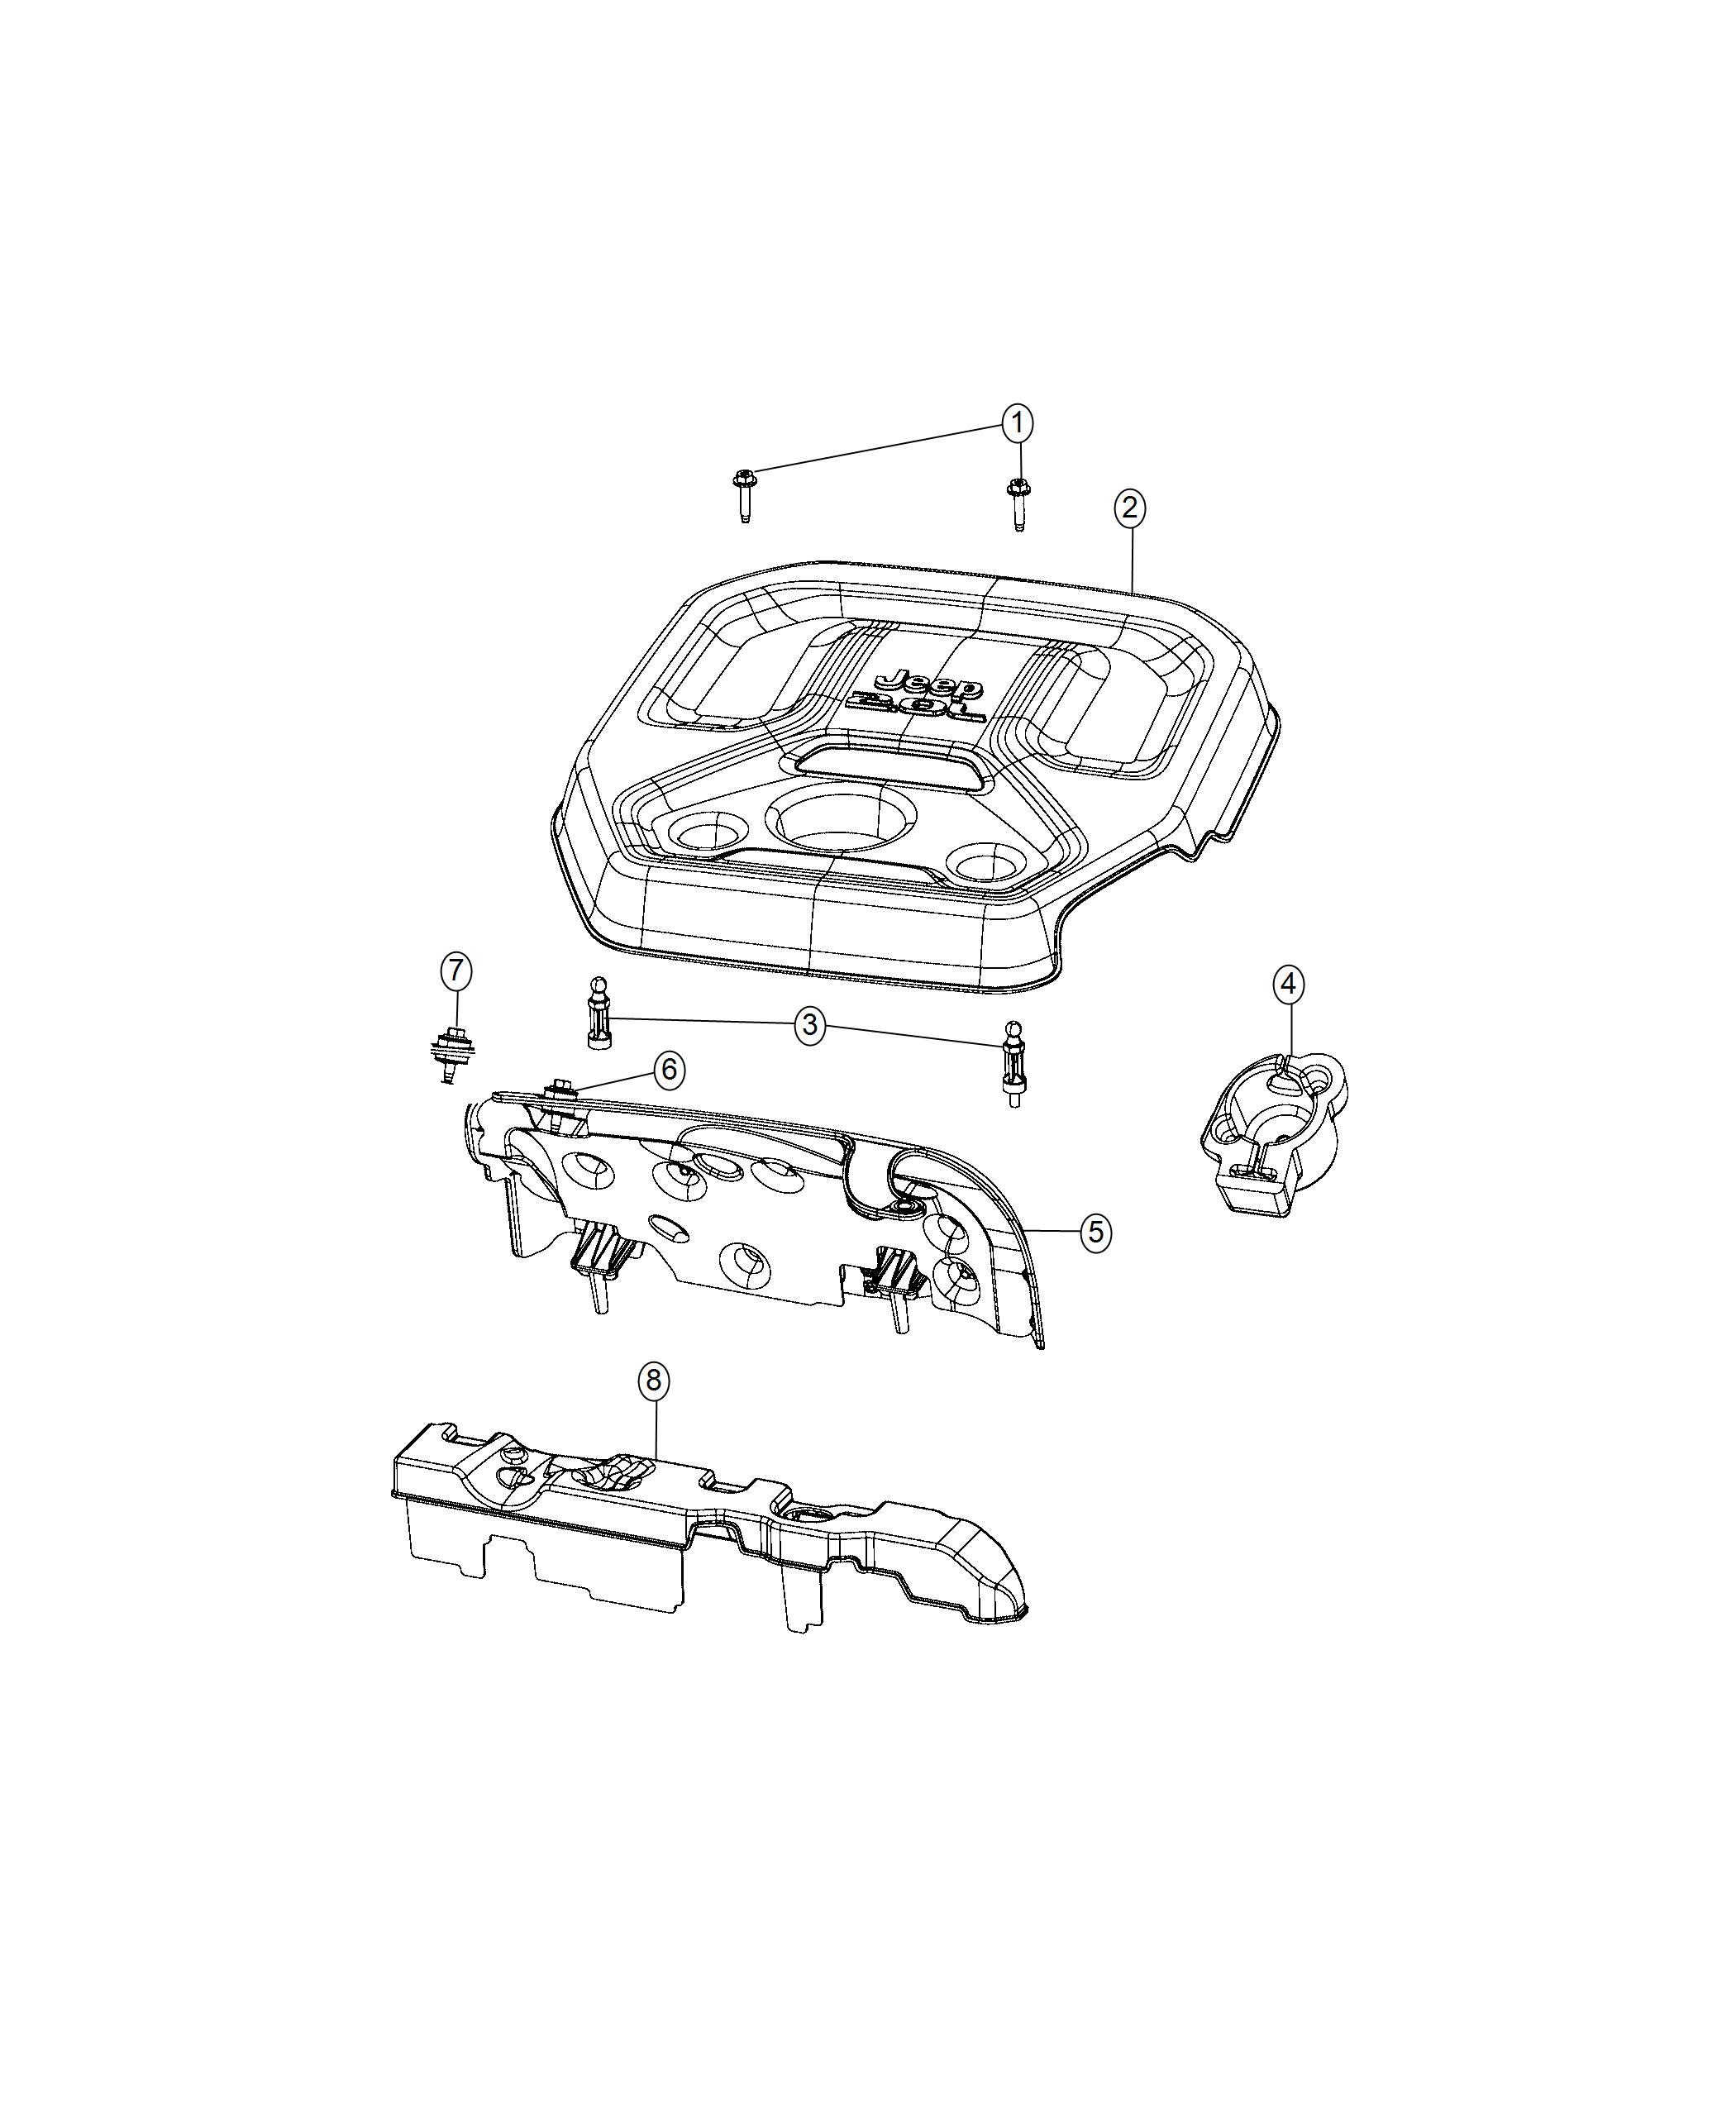 Jeep Wrangler Grommet Insulator